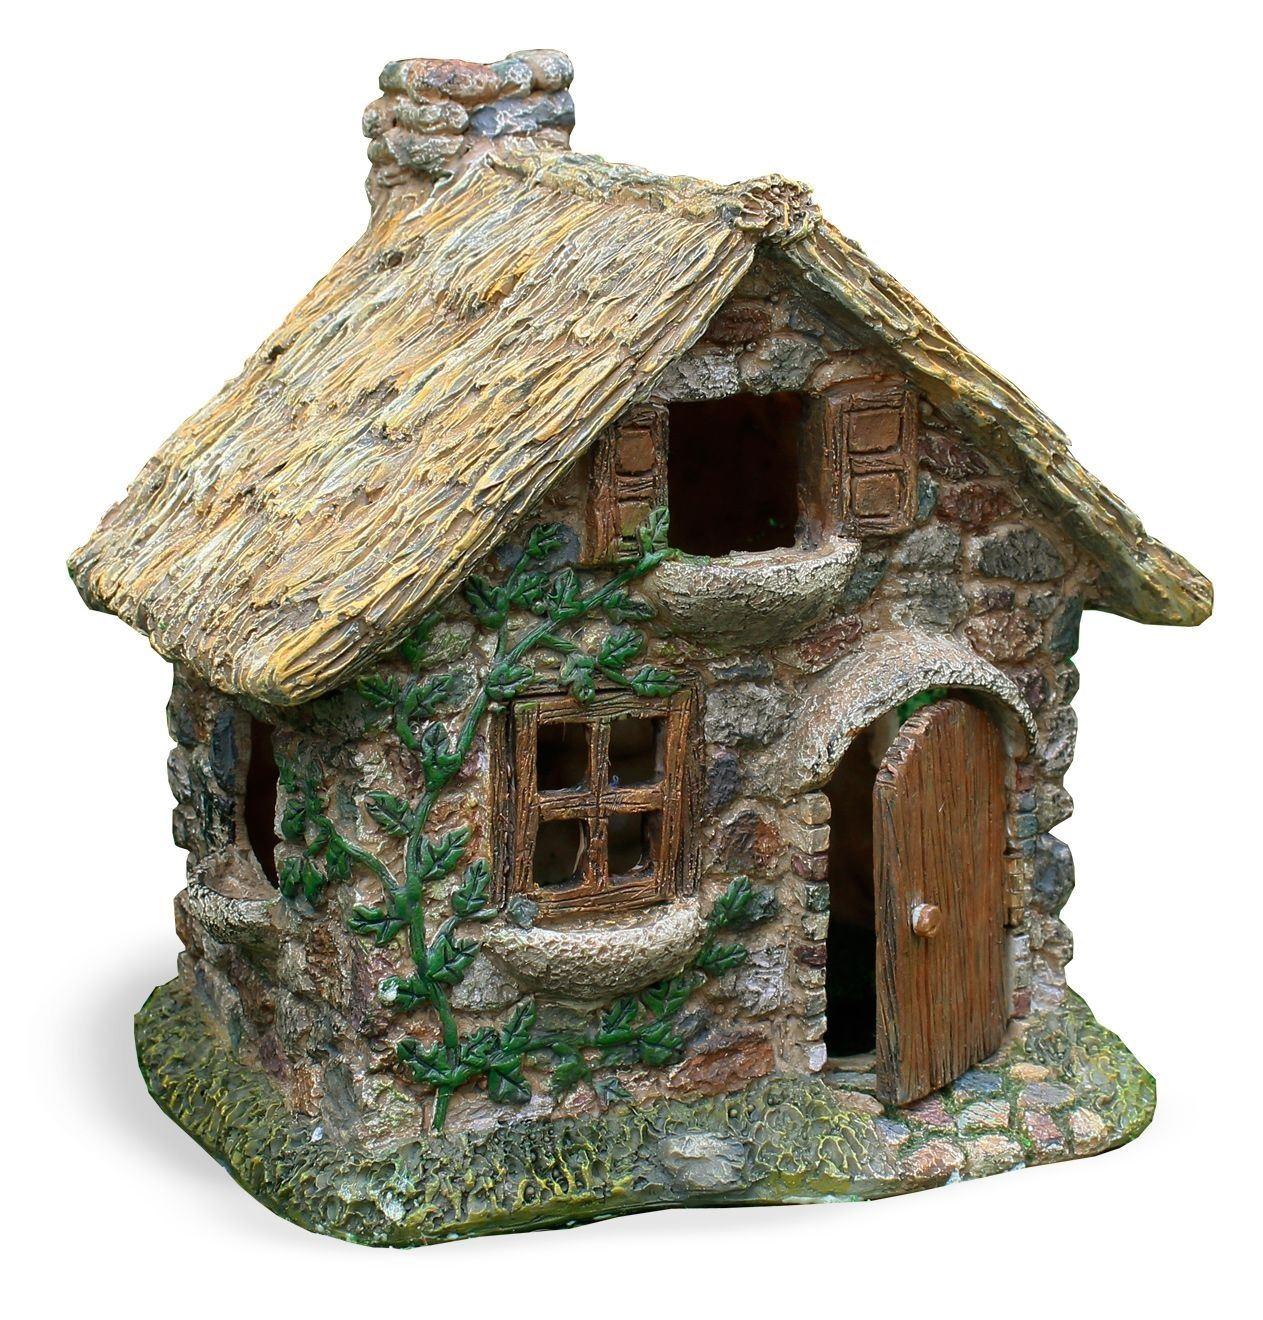 Miniatur-Micro-Mini-Fee-Gartenmoebel-Zubehoerteil-Figur-Geschenk-ZUHAUSE-Lot